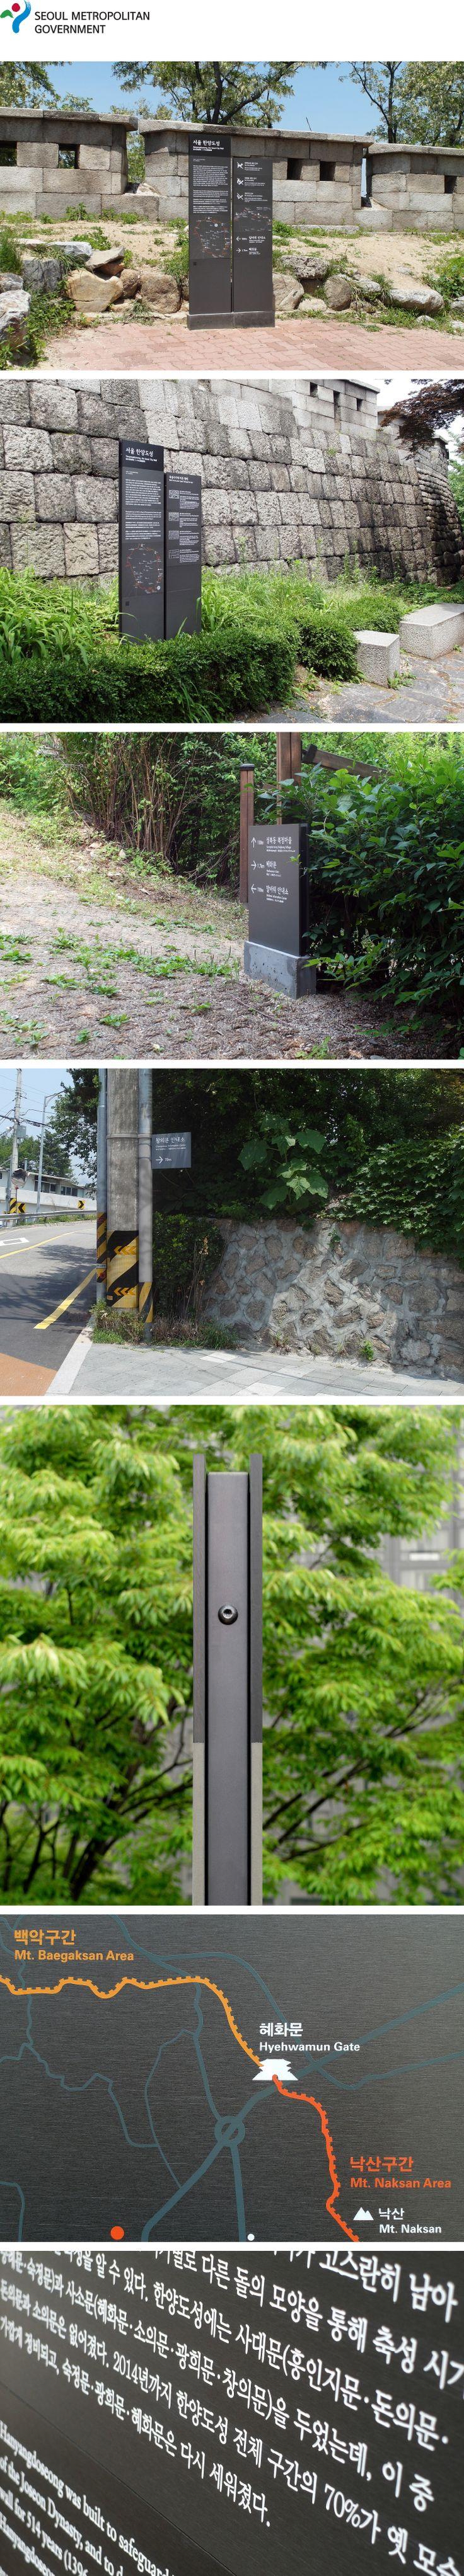 Seoul City Wall Signage System http://atelierdesign.kr